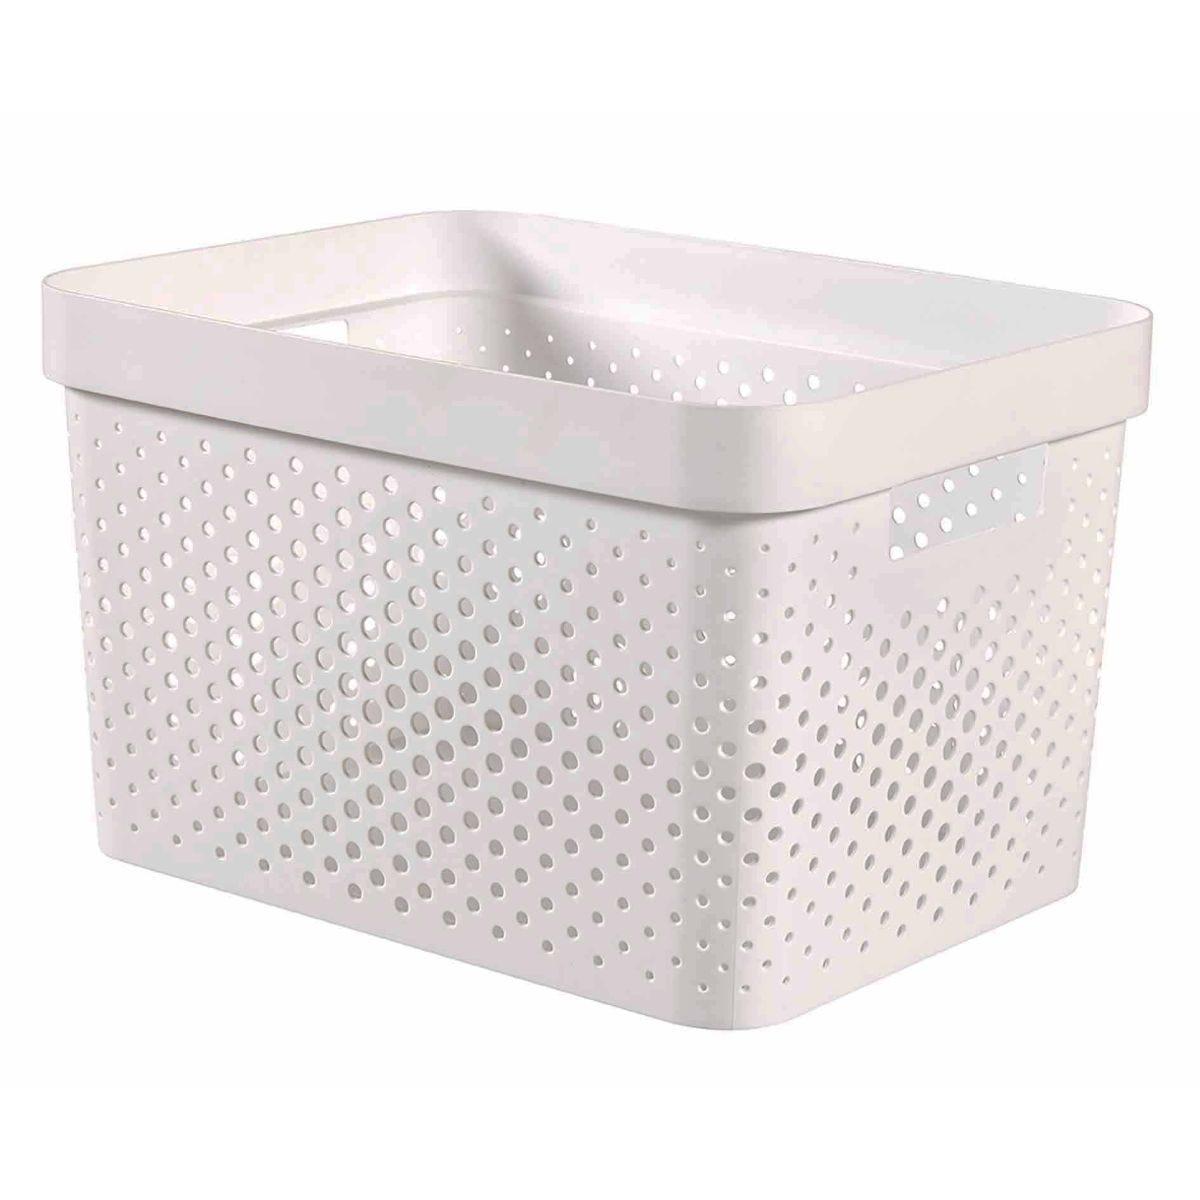 Curver Infinity Storage Basket 17 Litre, White